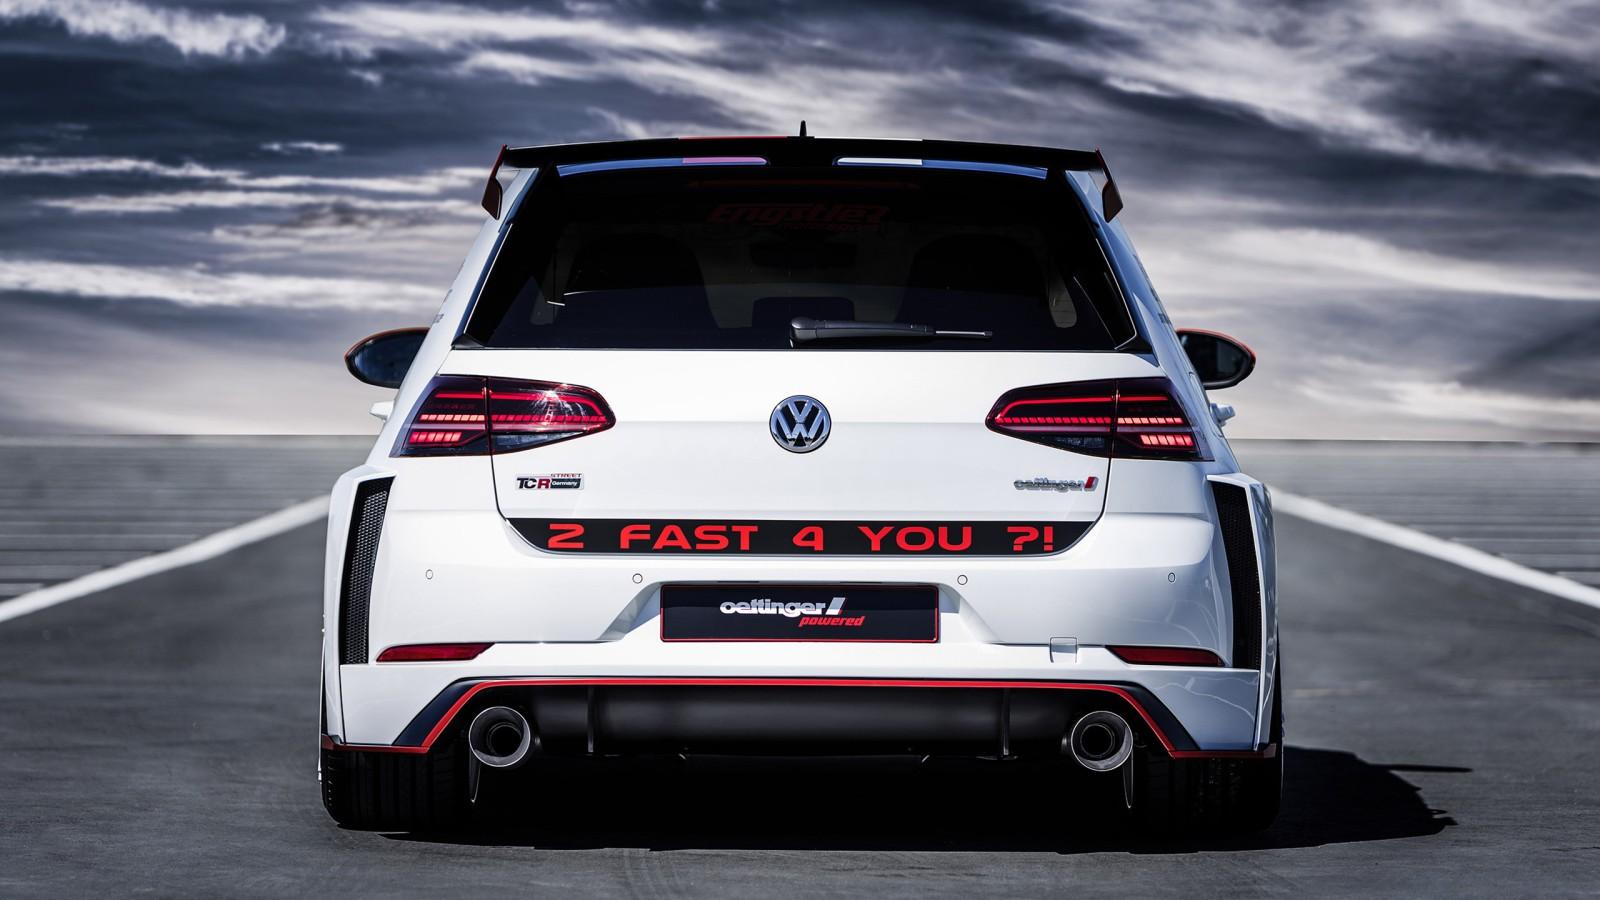 2018 Oettinger Volkswagen Golf Gti Tcr Germany Street 2